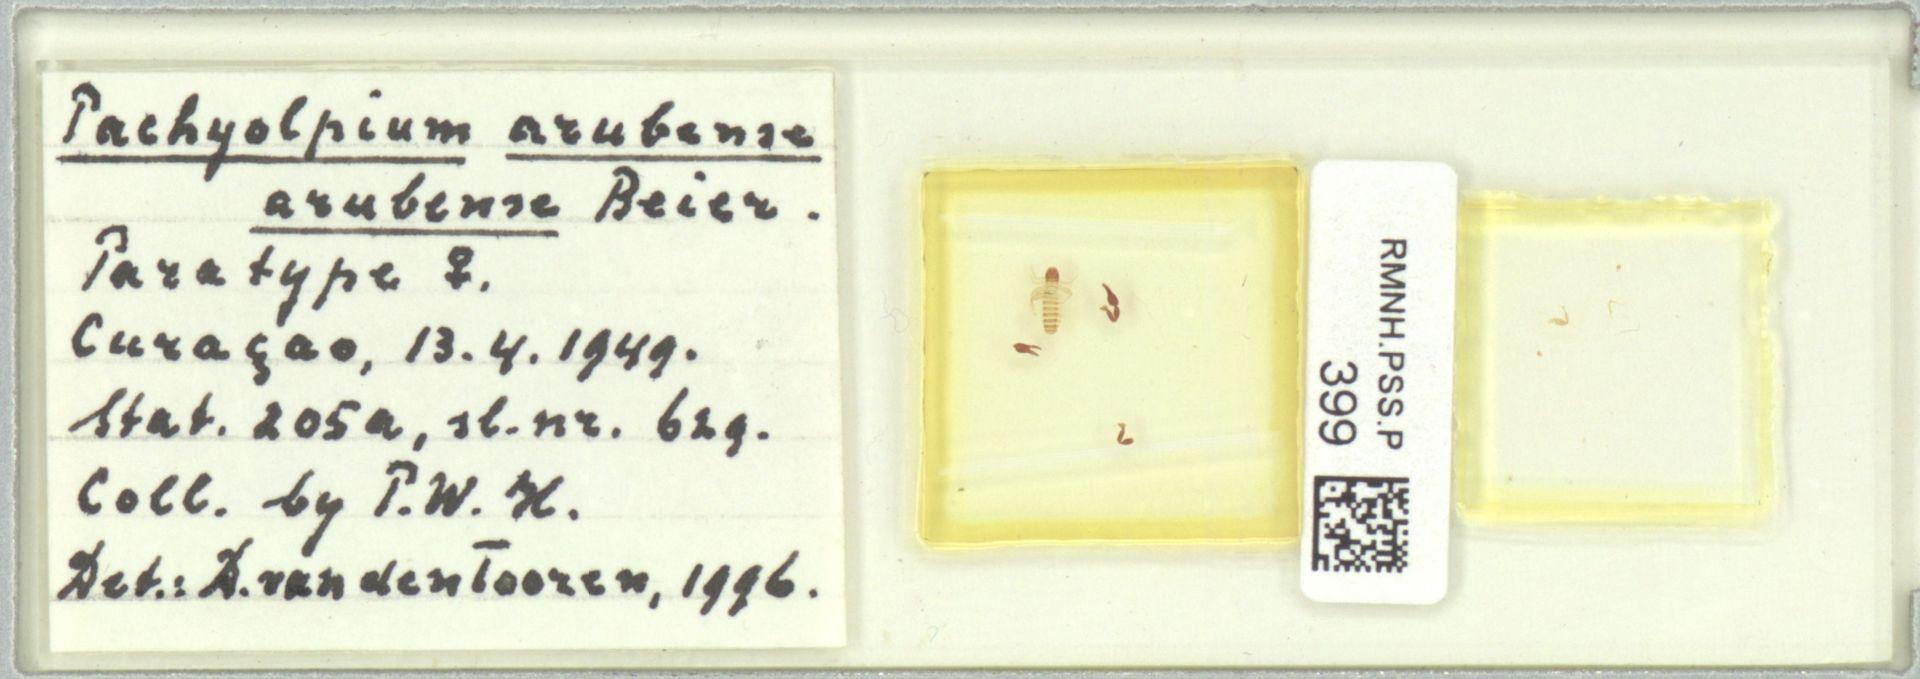 RMNH.PSS.P.399 | Pachyolpium (arubense) arubense